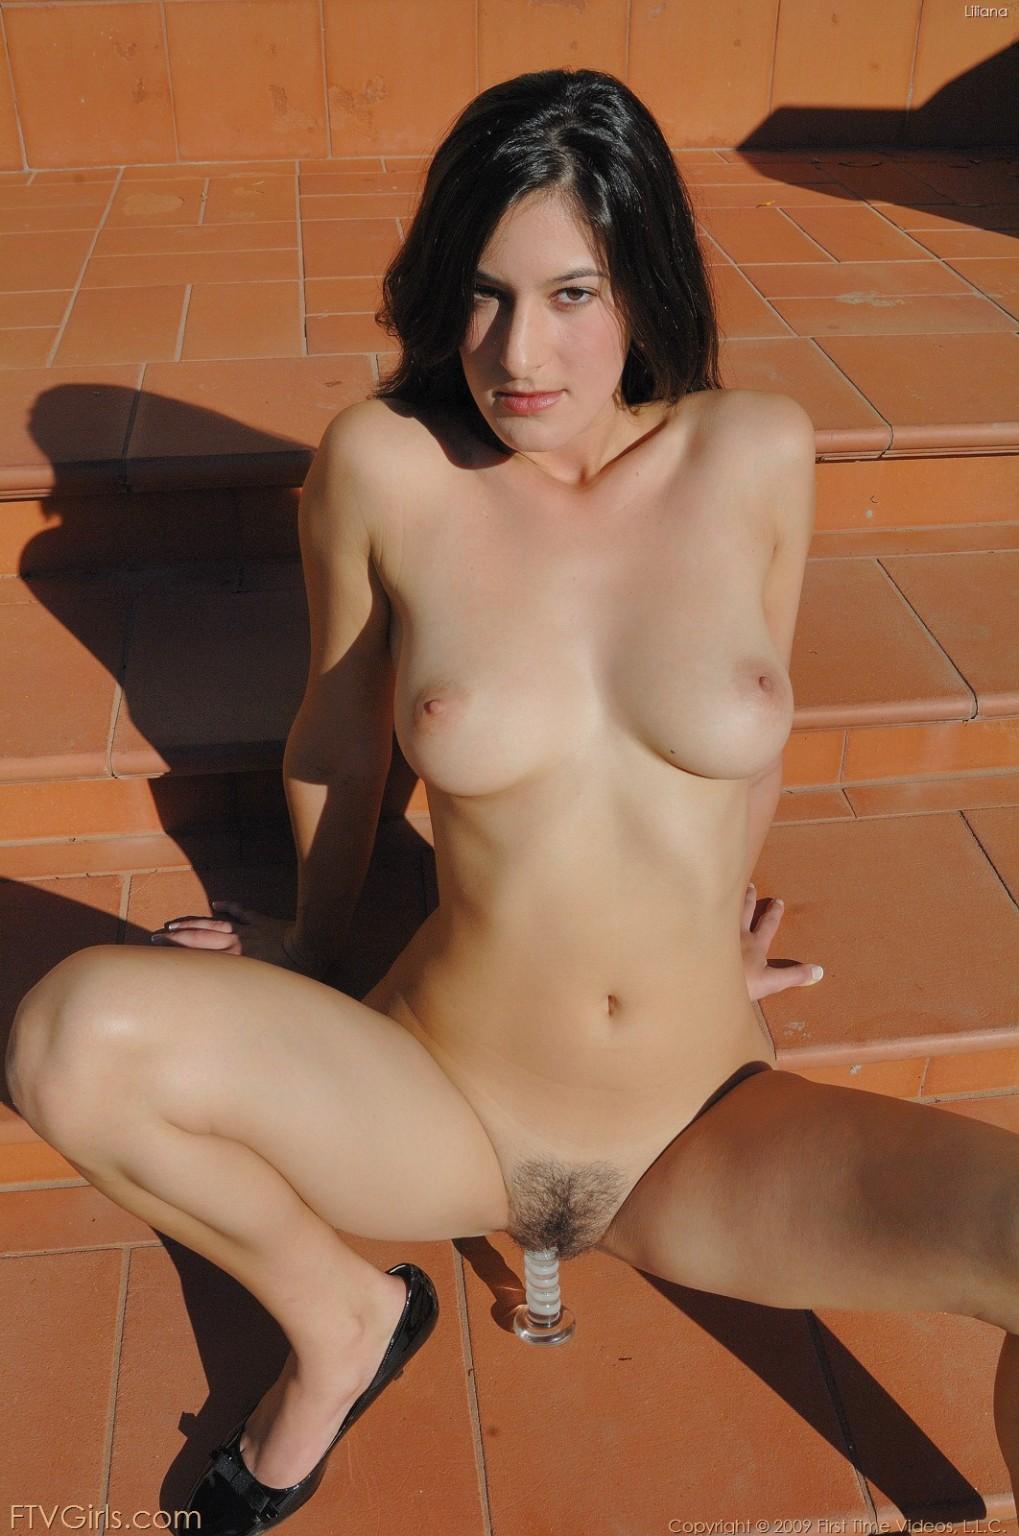 Nude liliana model pussy opinion you